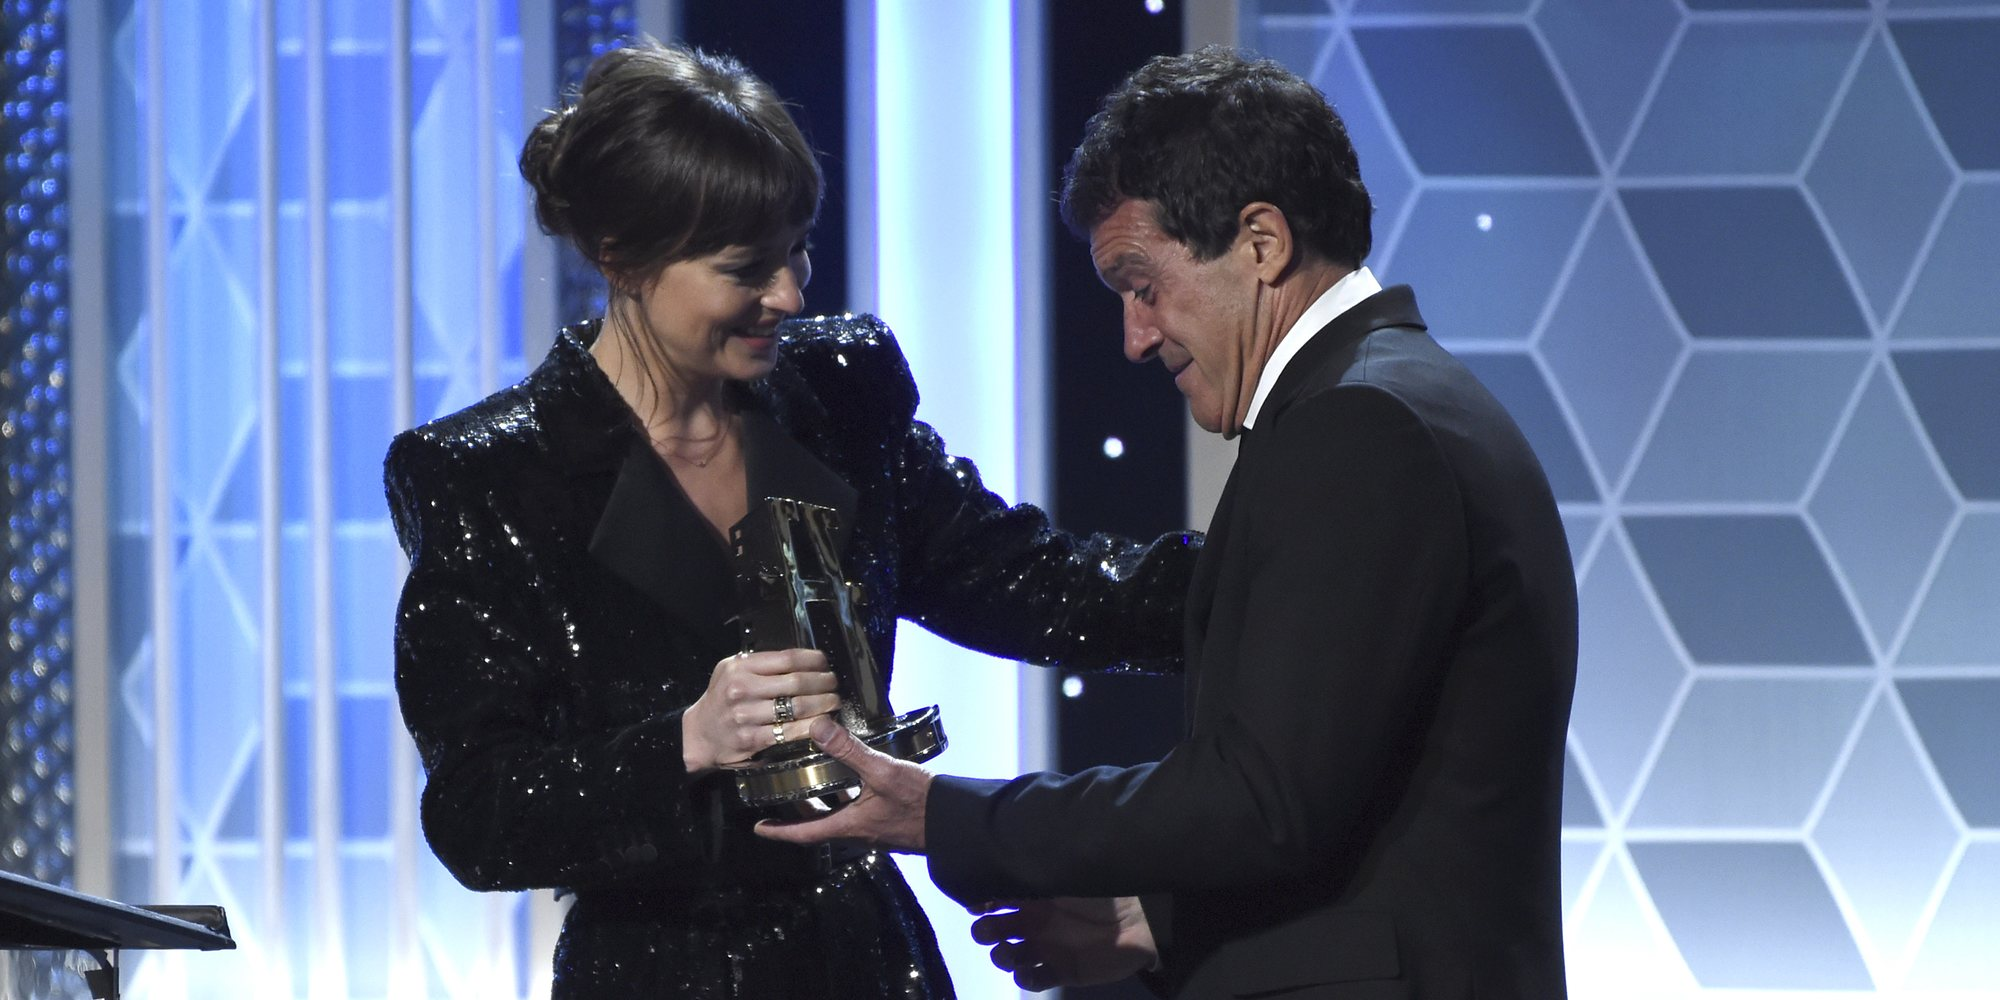 Dakota Johnson entrega un premio a Antonio Banderas en la gala Hollywood Film Awards 2019